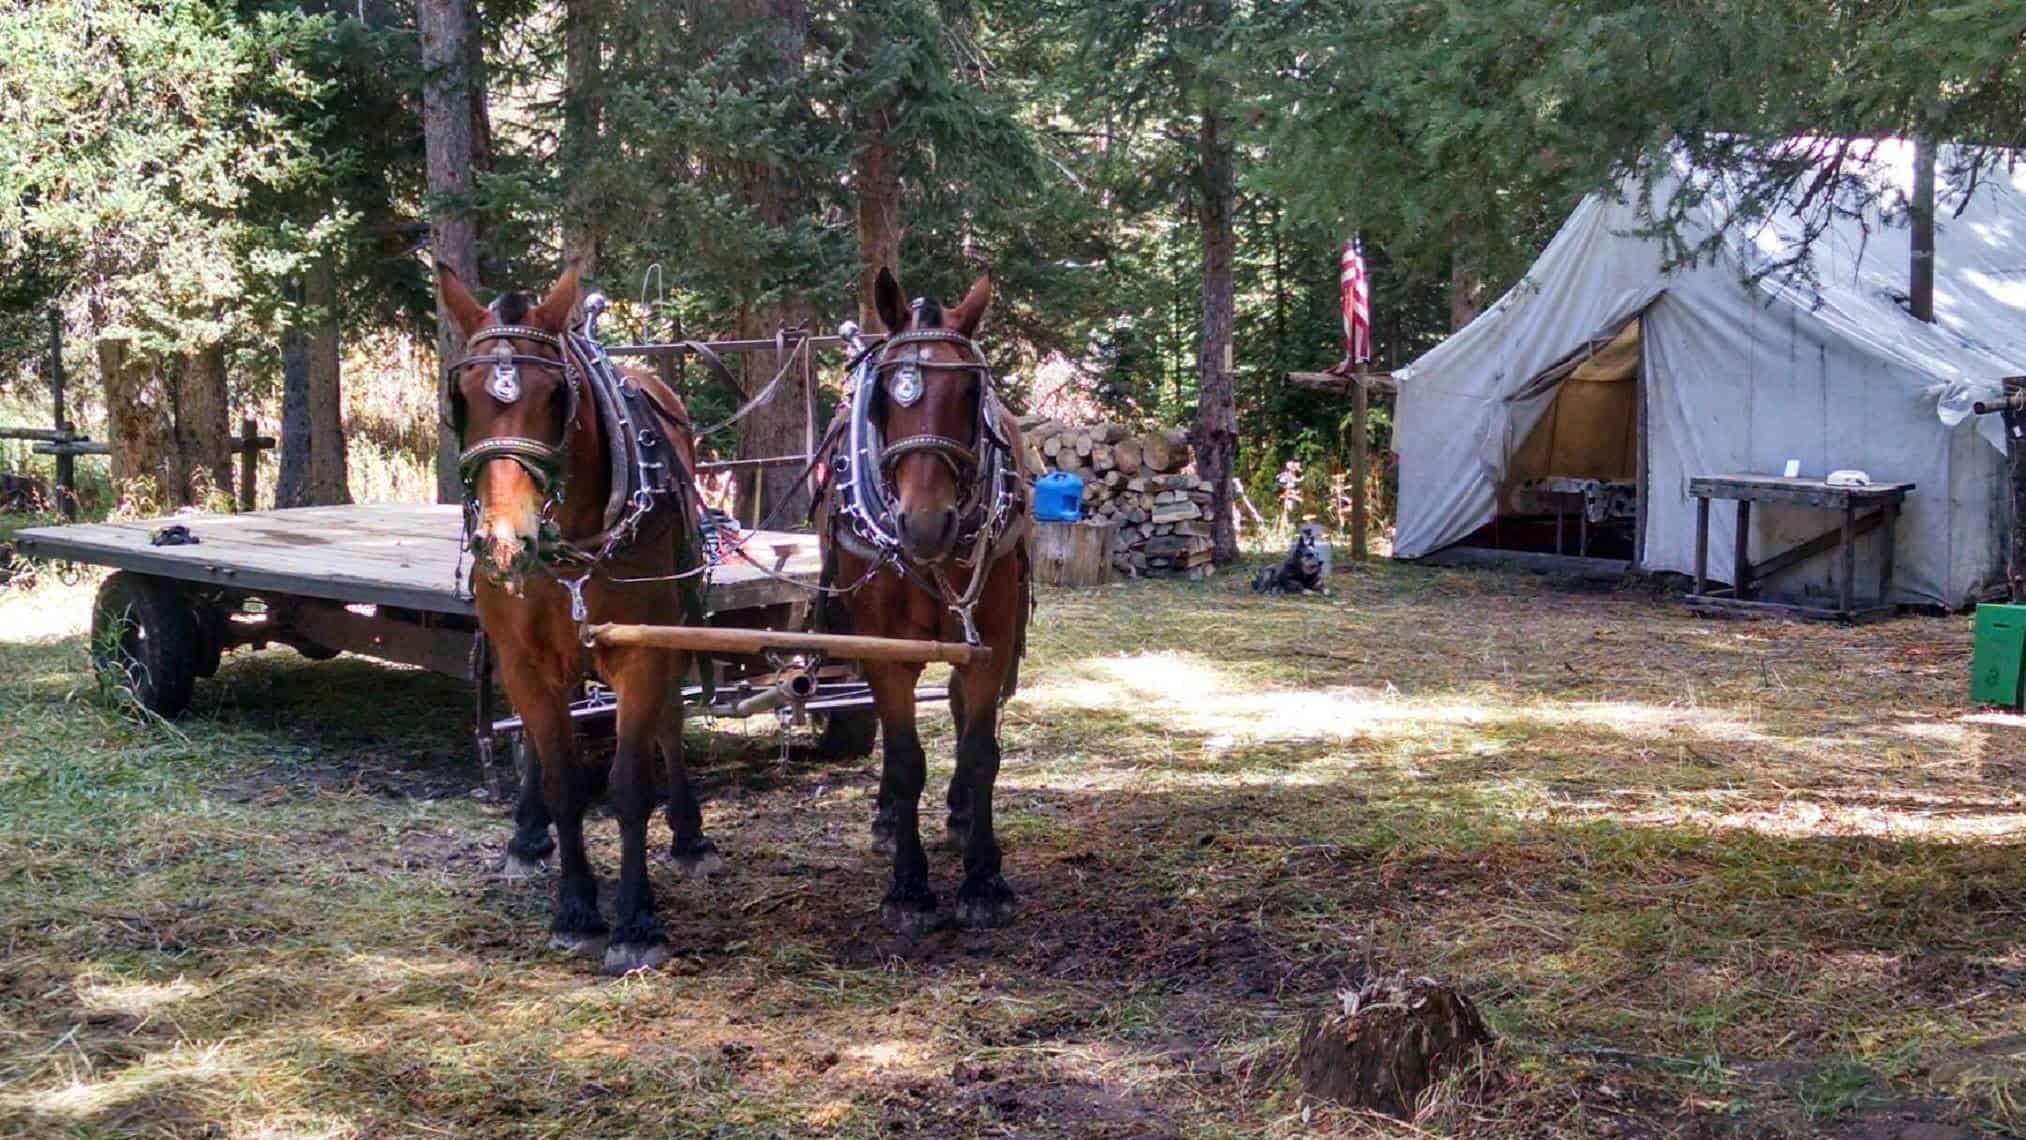 Horses & Equipment